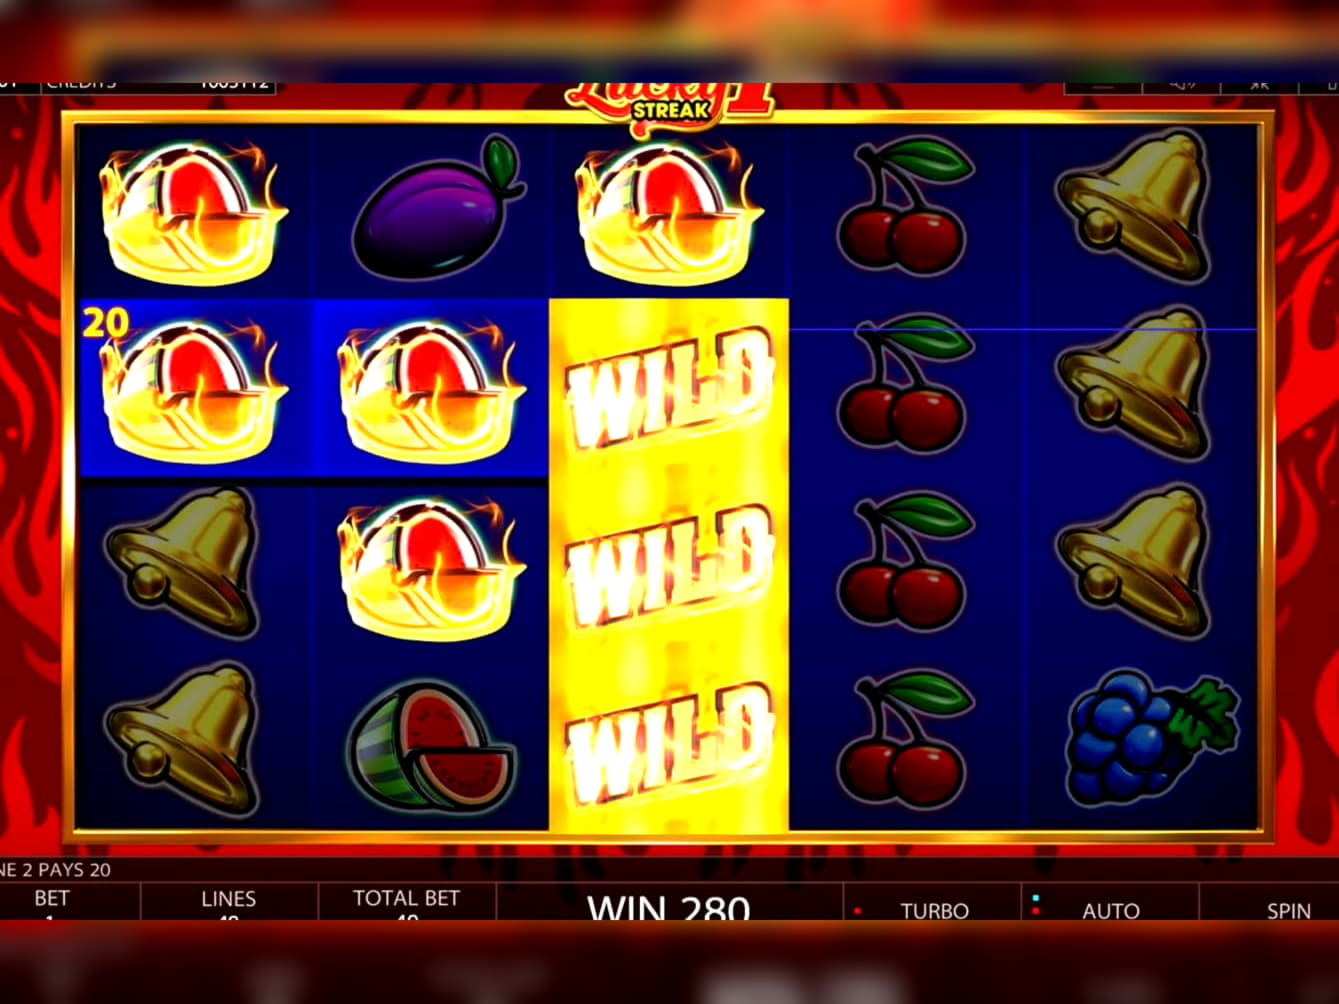 Eur 465 Free chip casino at Mrgreen Casino